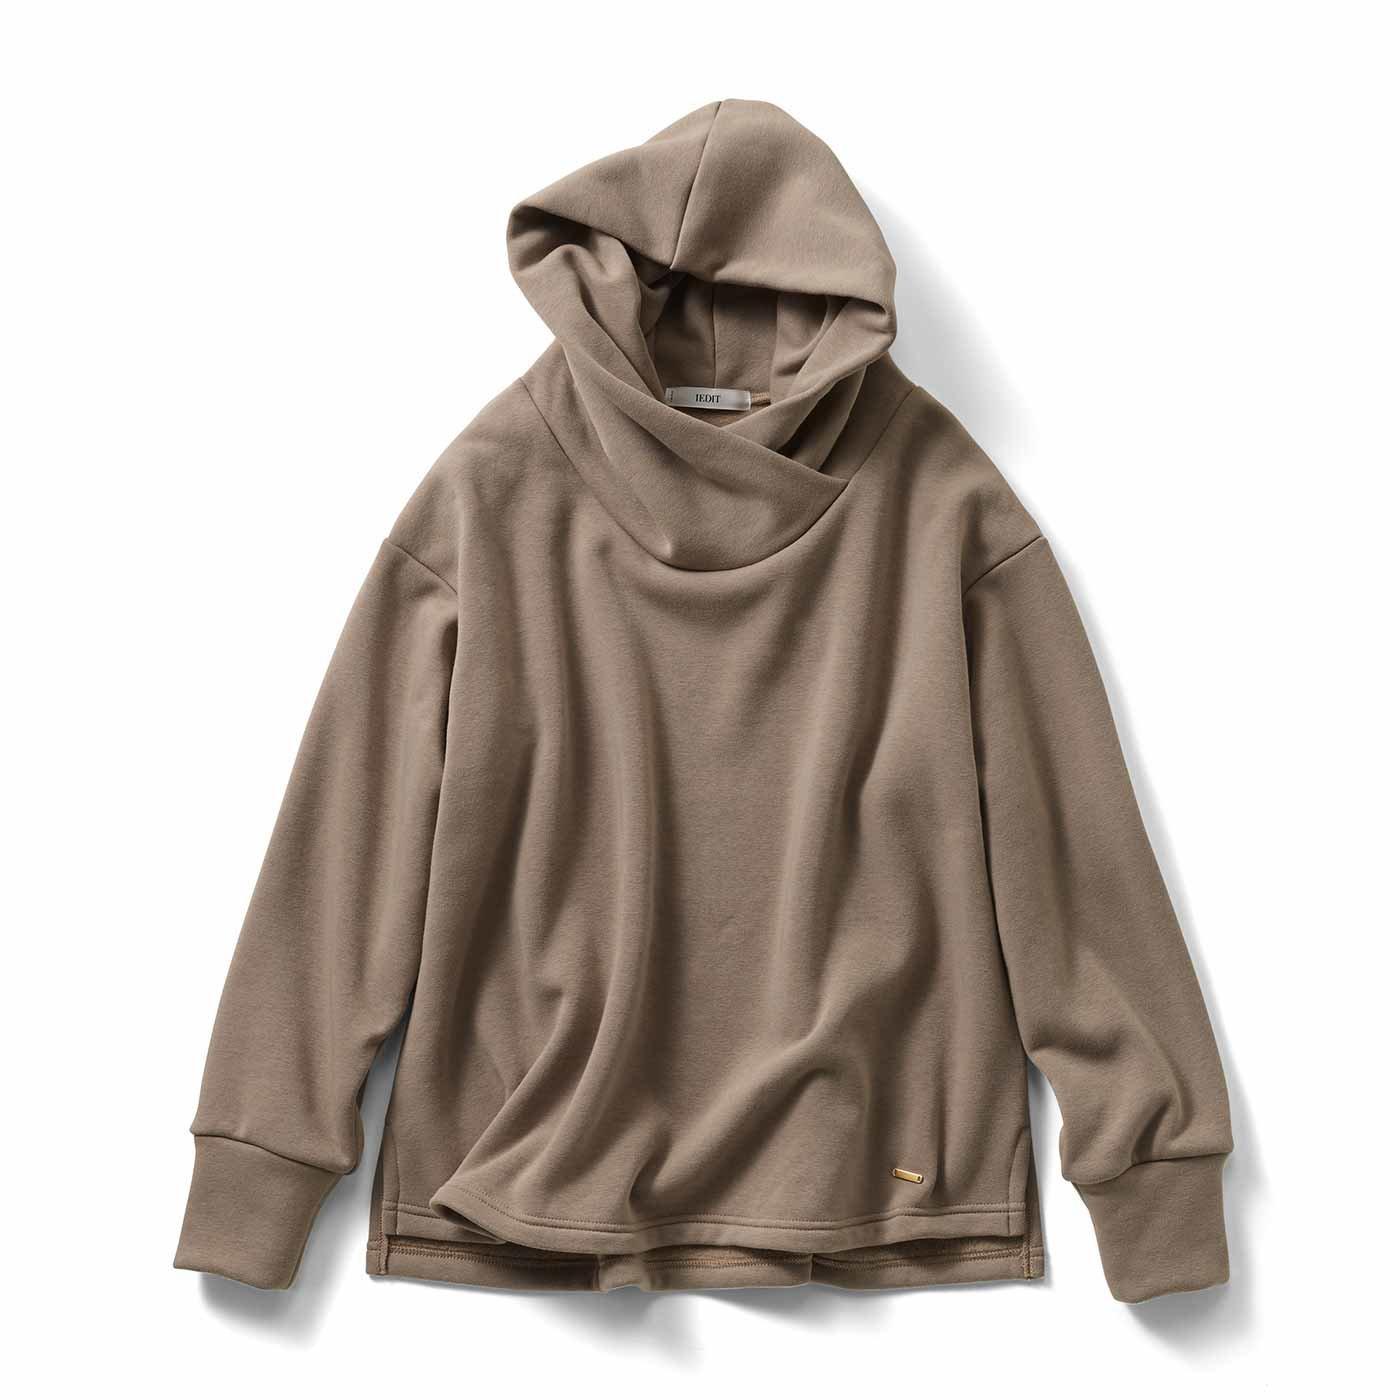 IEDIT[イディット] 裏シャギー素材が暖かい 衿高フードの小顔見えパーカー〈ピンクベージュ〉